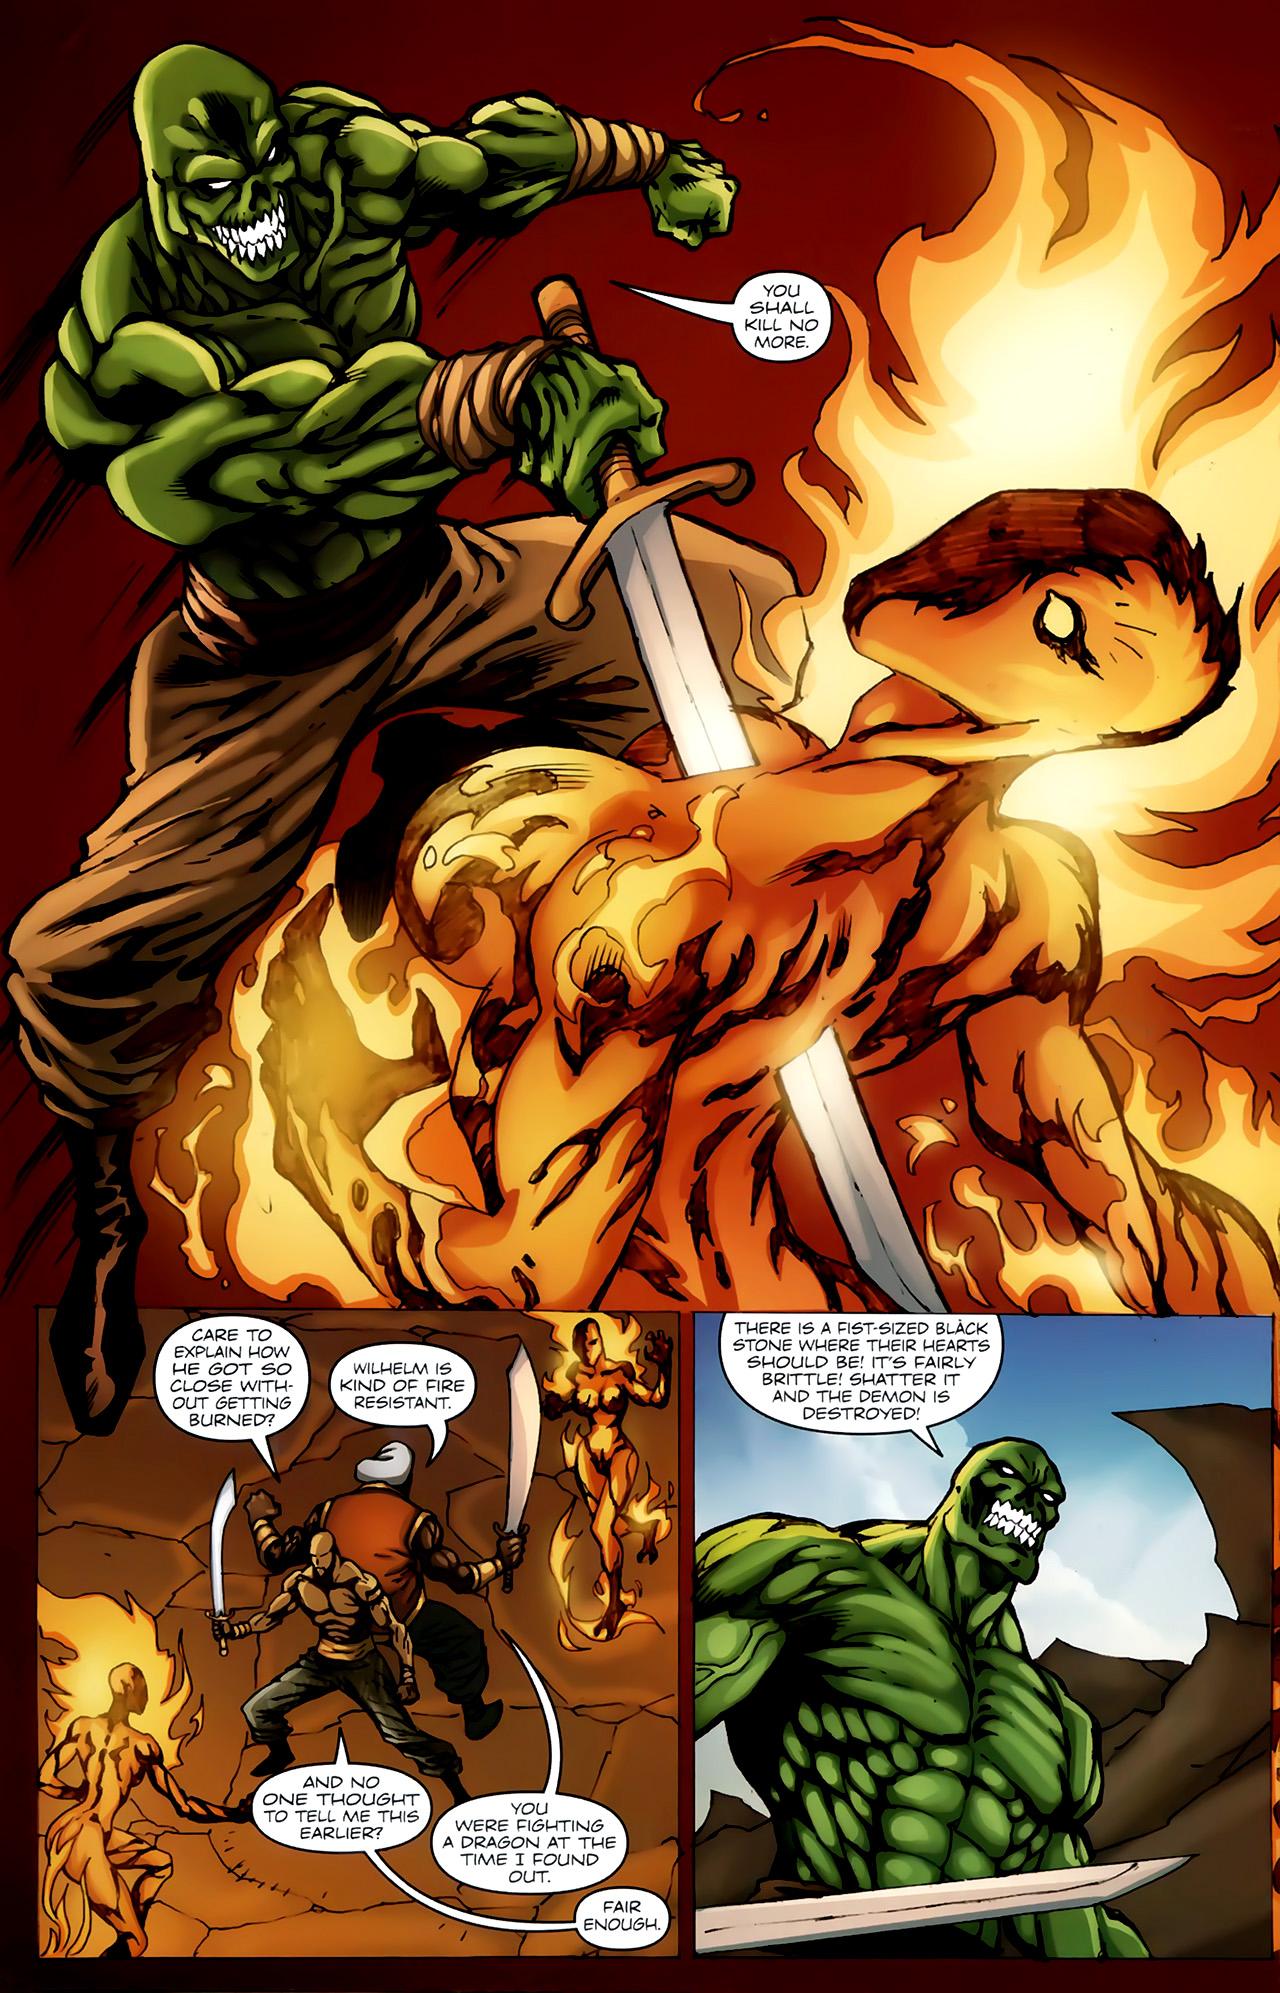 Read online 1001 Arabian Nights: The Adventures of Sinbad comic -  Issue #4 - 17